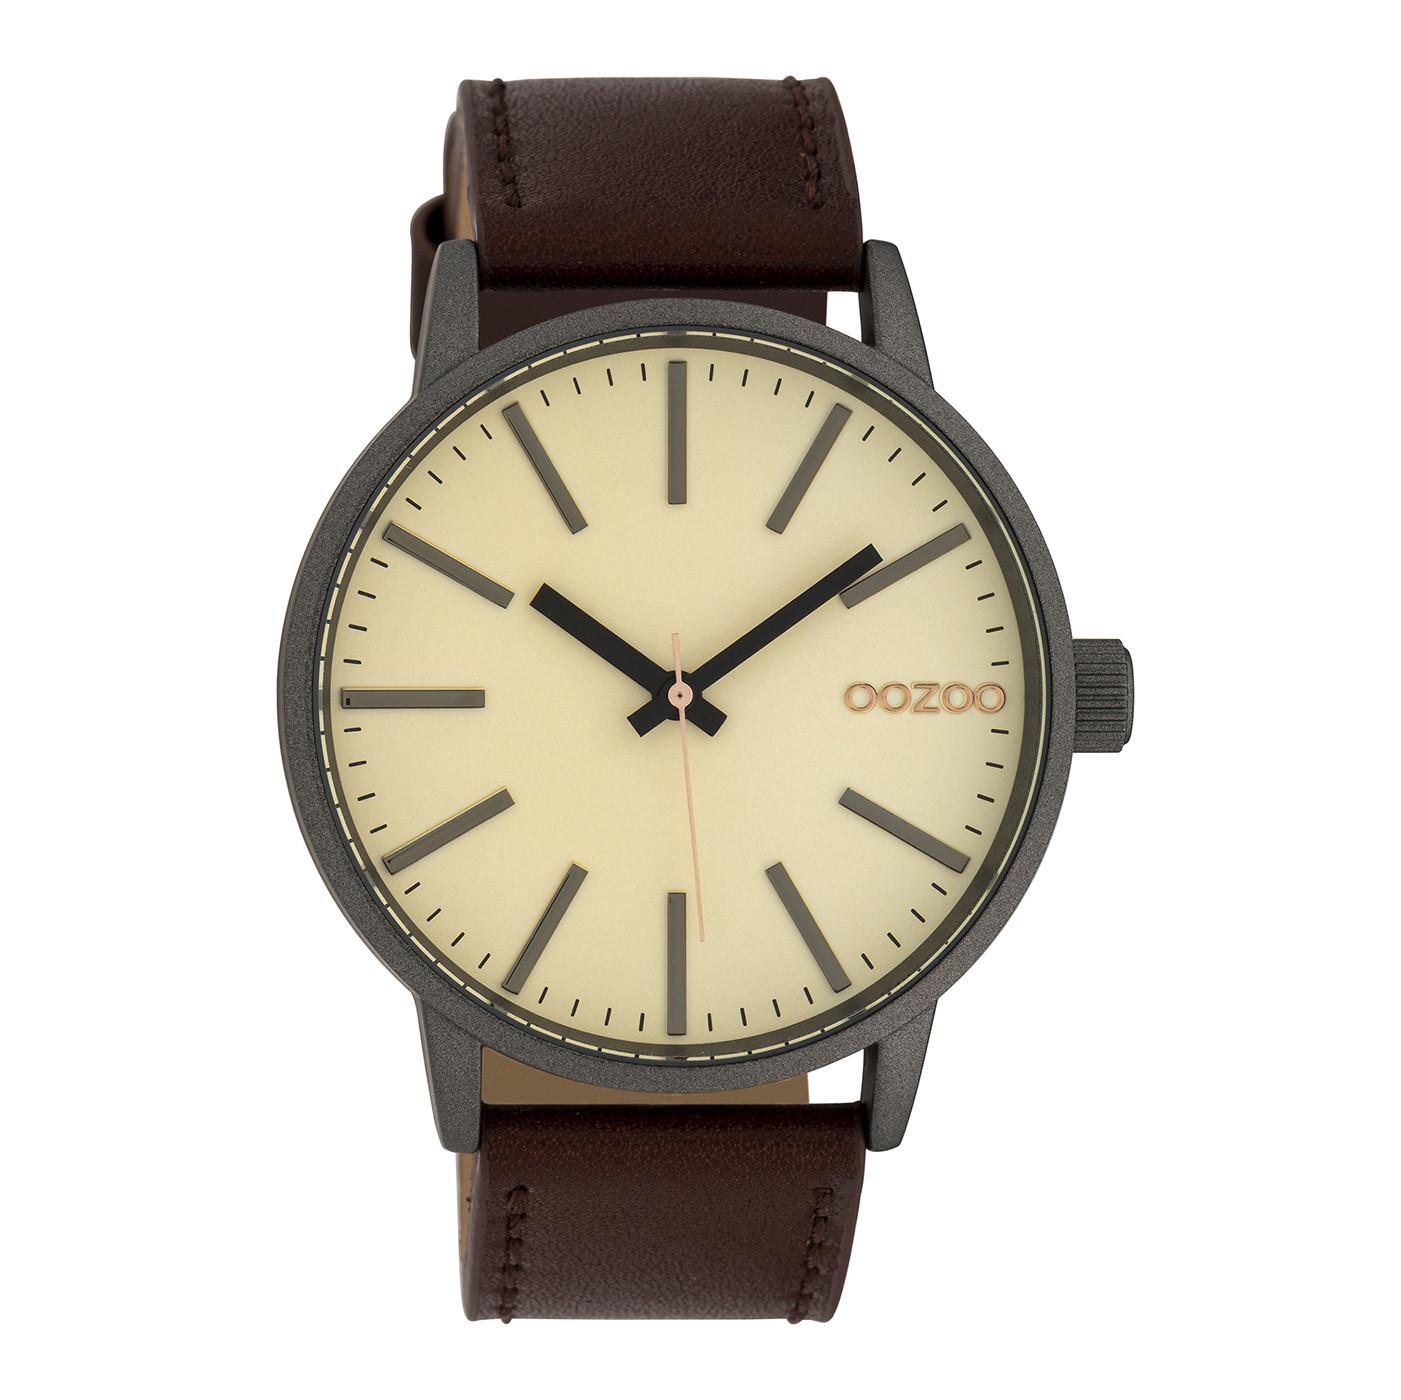 OOZOO Timepieces Cognac/Cream horloge C10010 (45 mm)